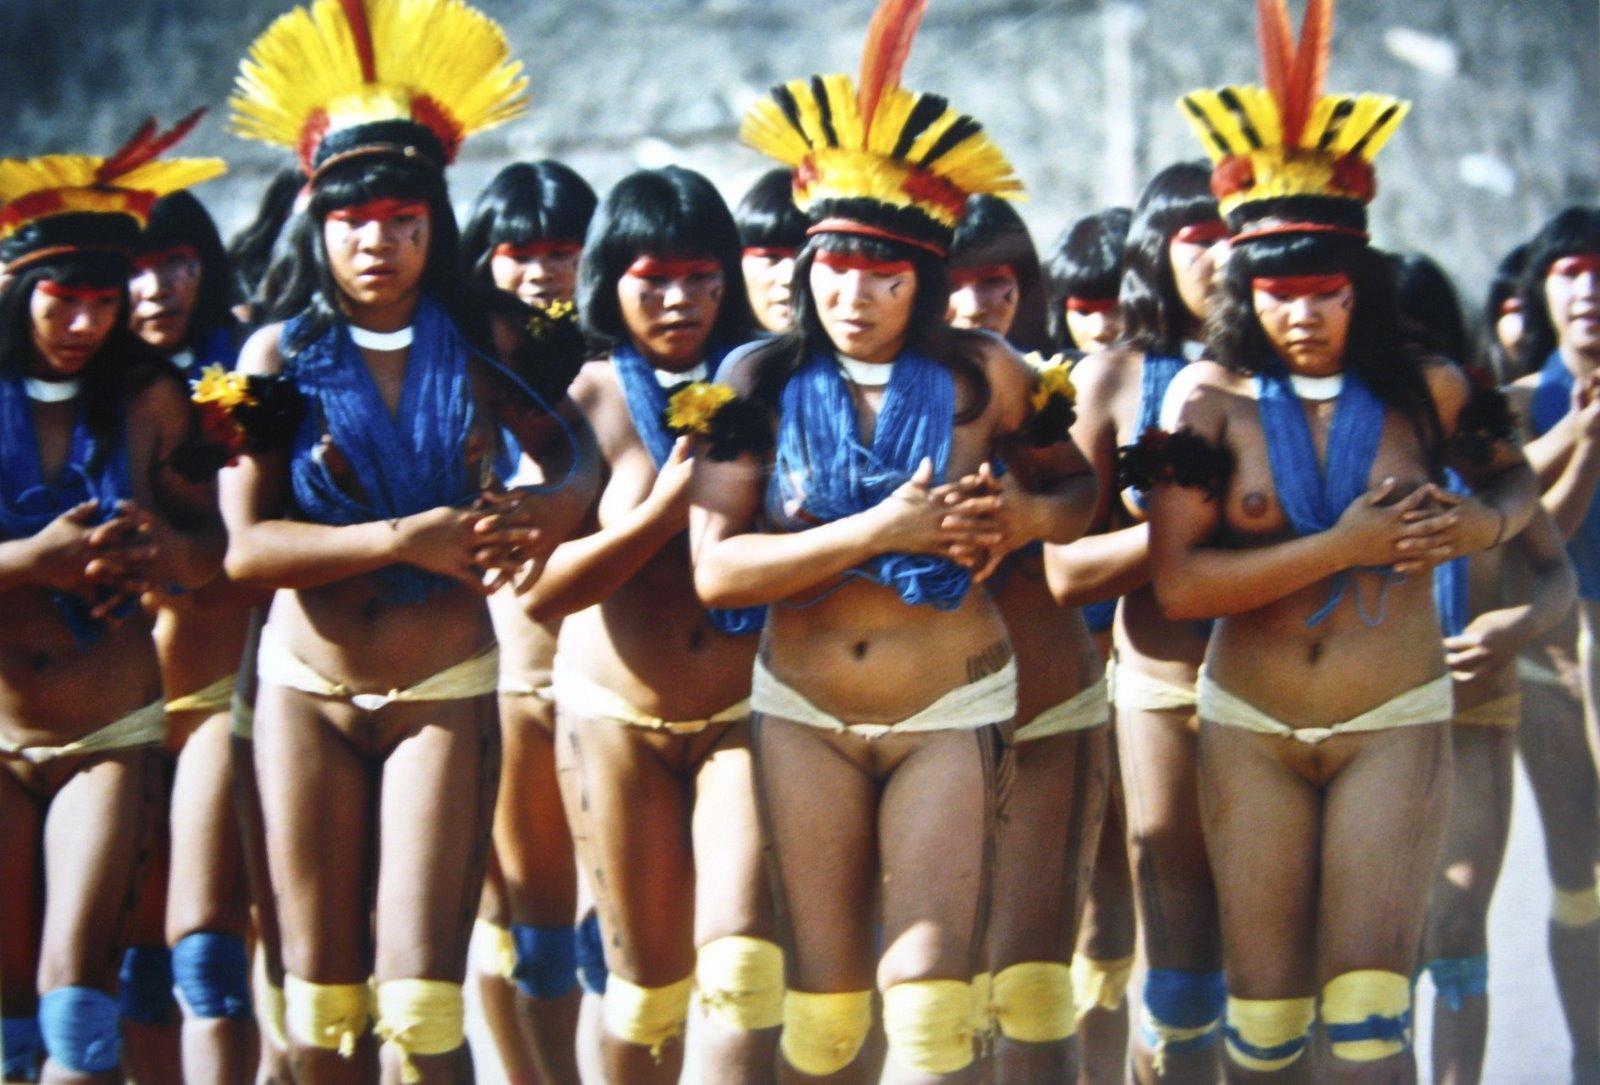 Секс фото с индейцами 2 фотография